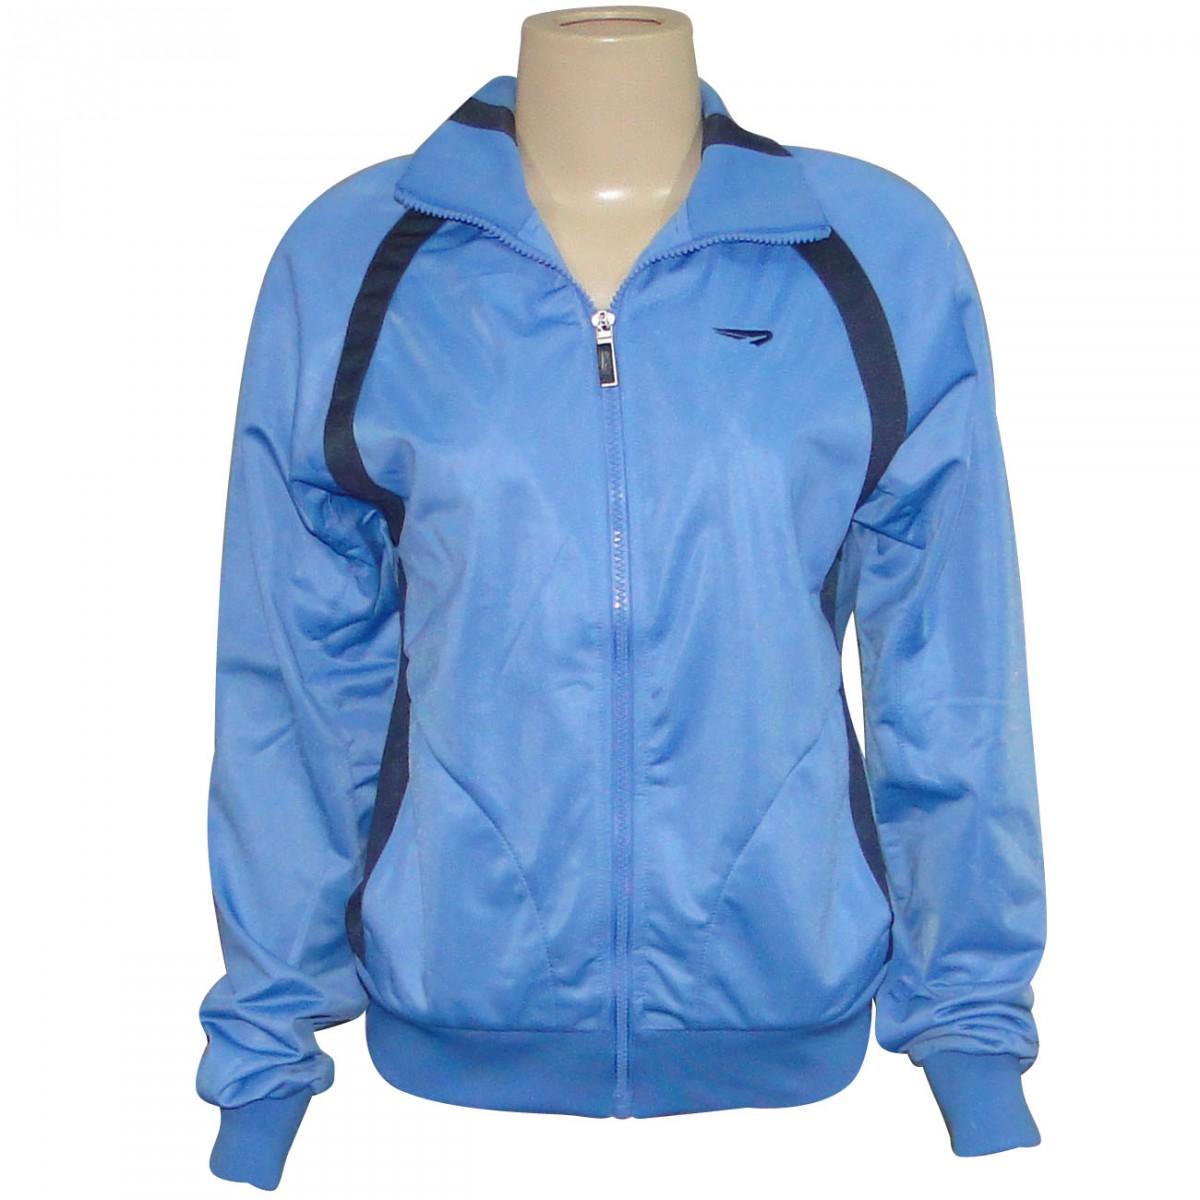 4e111198d1f Agasalho Rainha Ciana Feminino 4128622 - Azul Marinho - Chuteira Nike